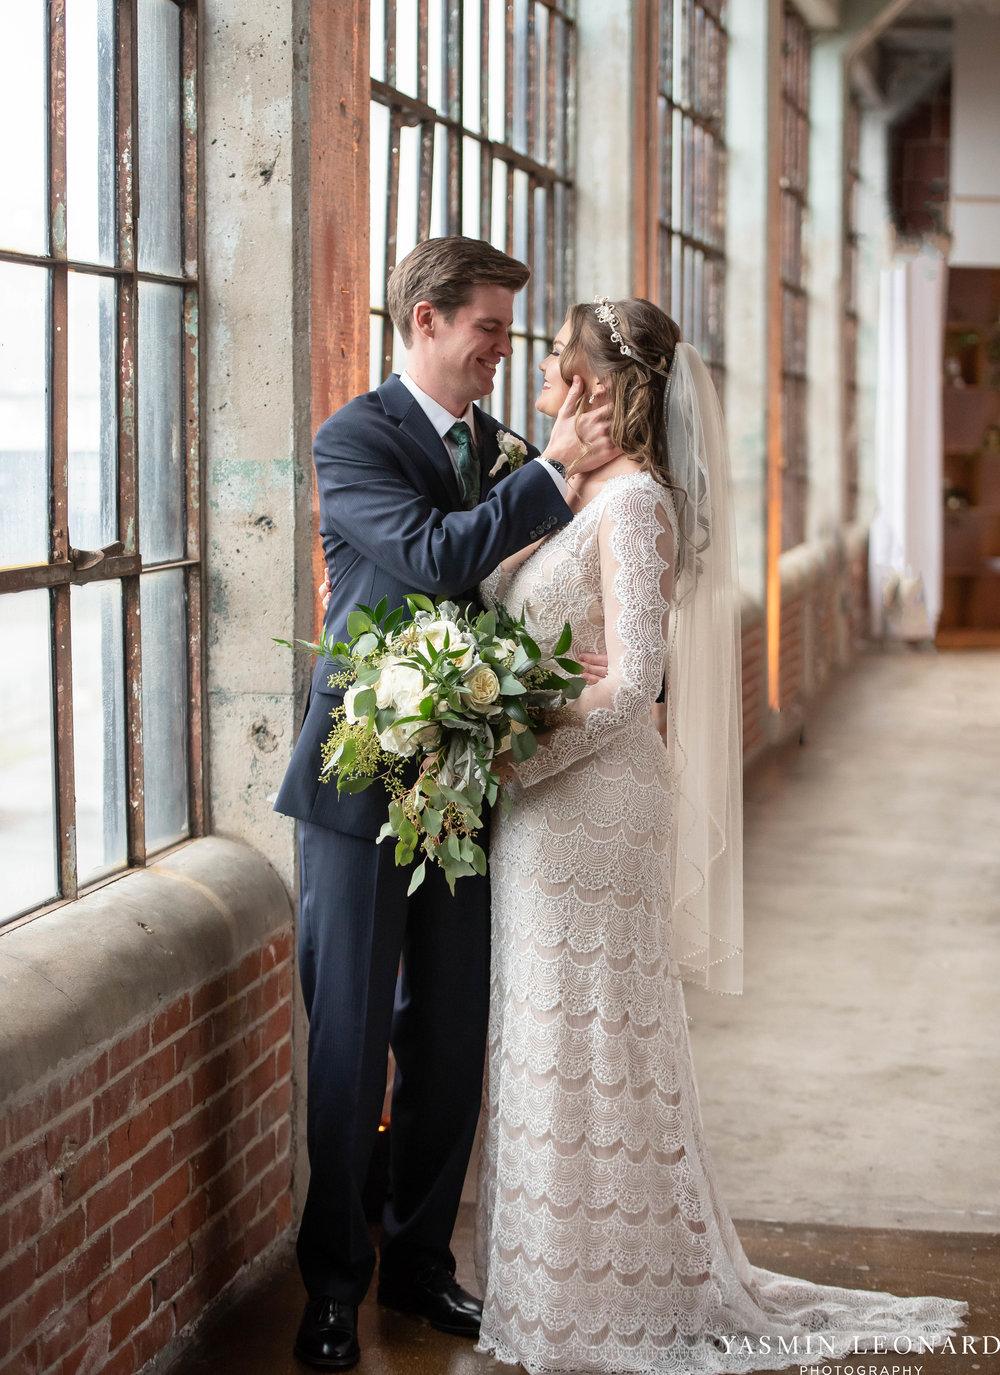 The Lofts at Union Square - Unions - High Point Weddings - NC Weddings - NC Wedding Photographer - Yasmin Leonard Photography - Just Priceless - Green Pink and Gold Wedding - Elegant Wedding-32.jpg